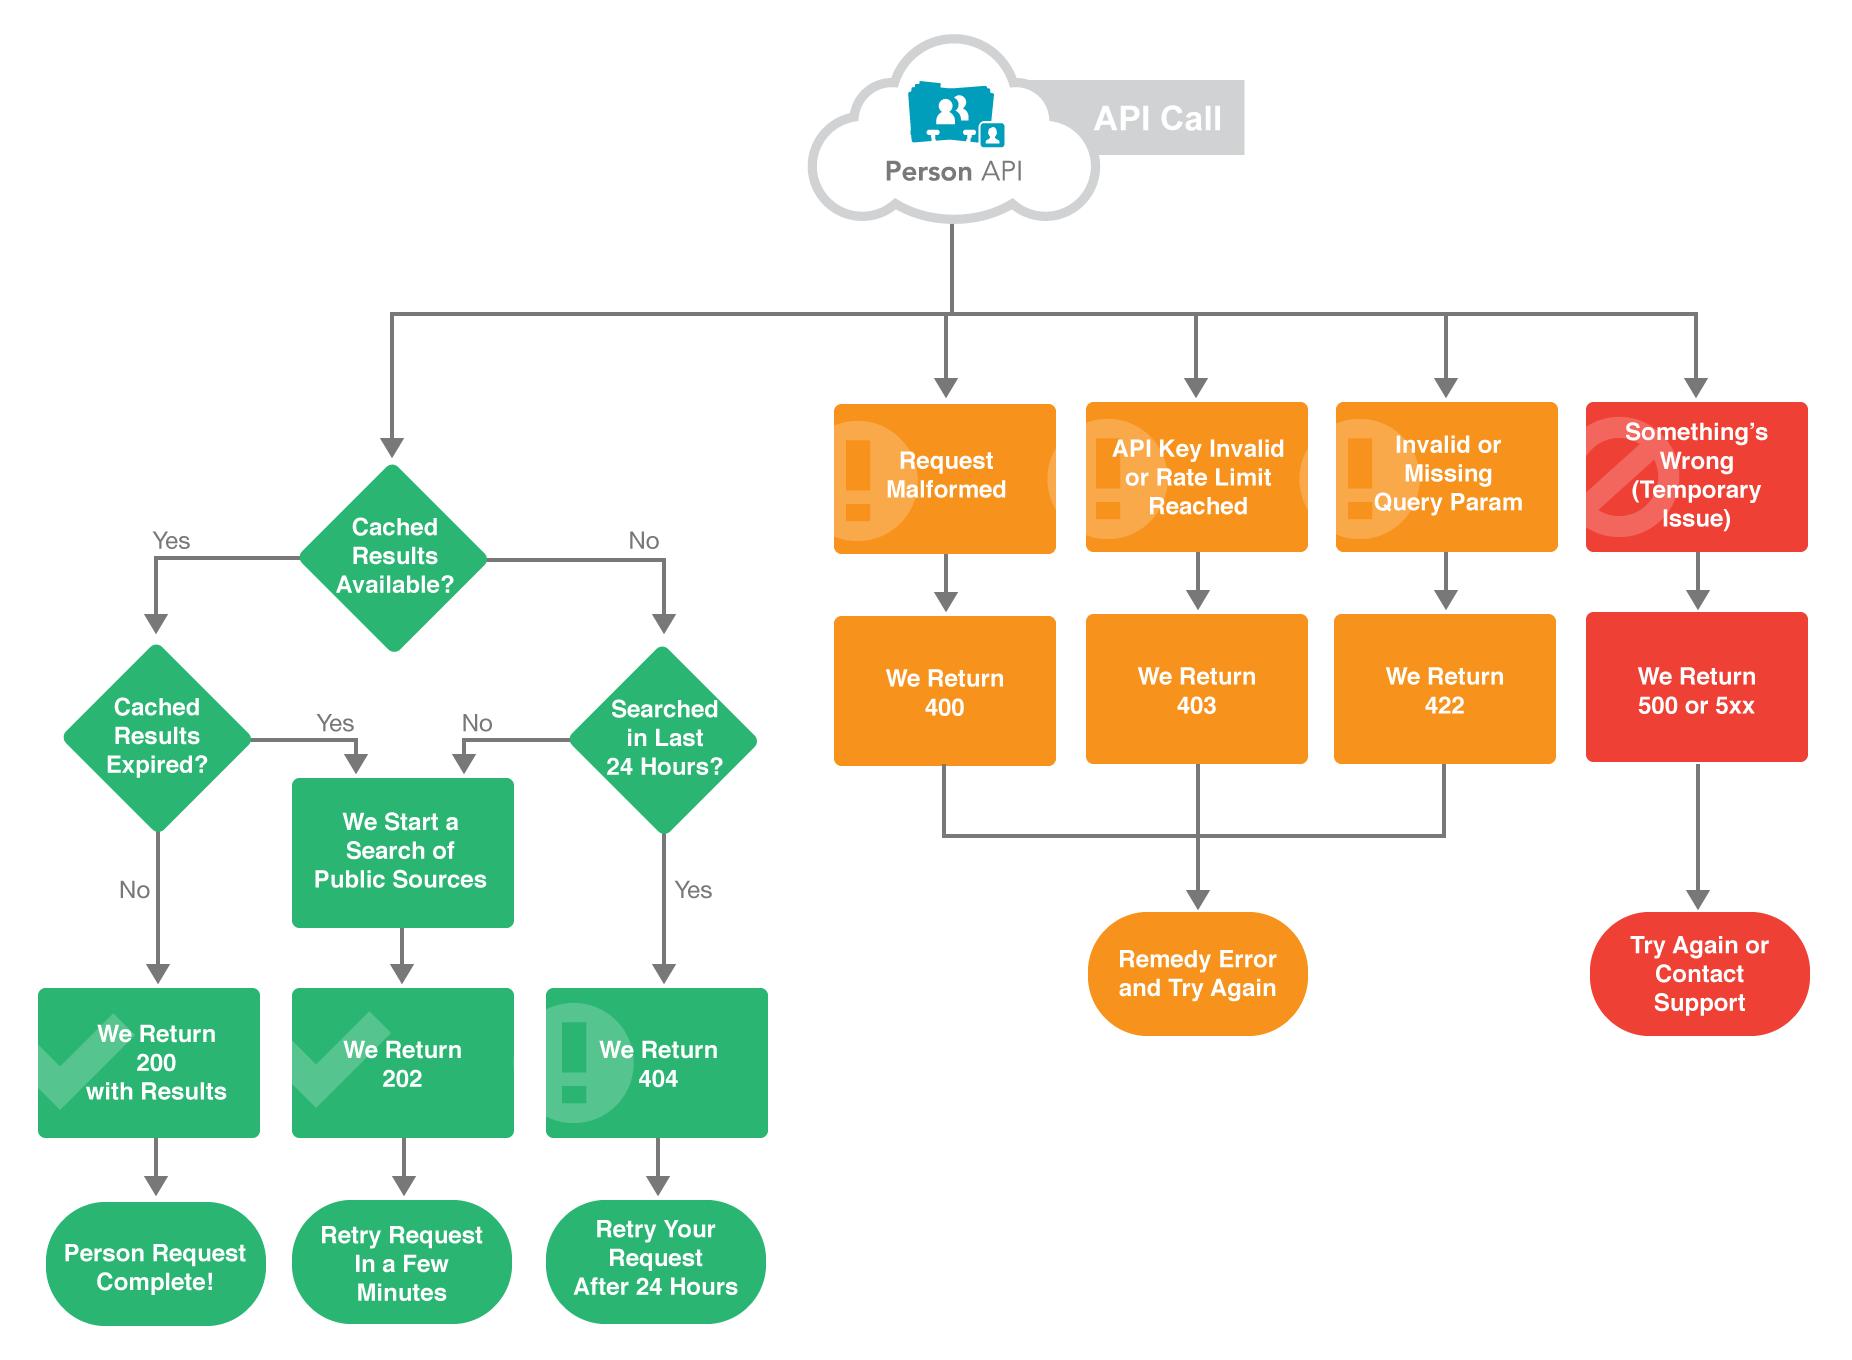 FullContact Person API Flow Diagram